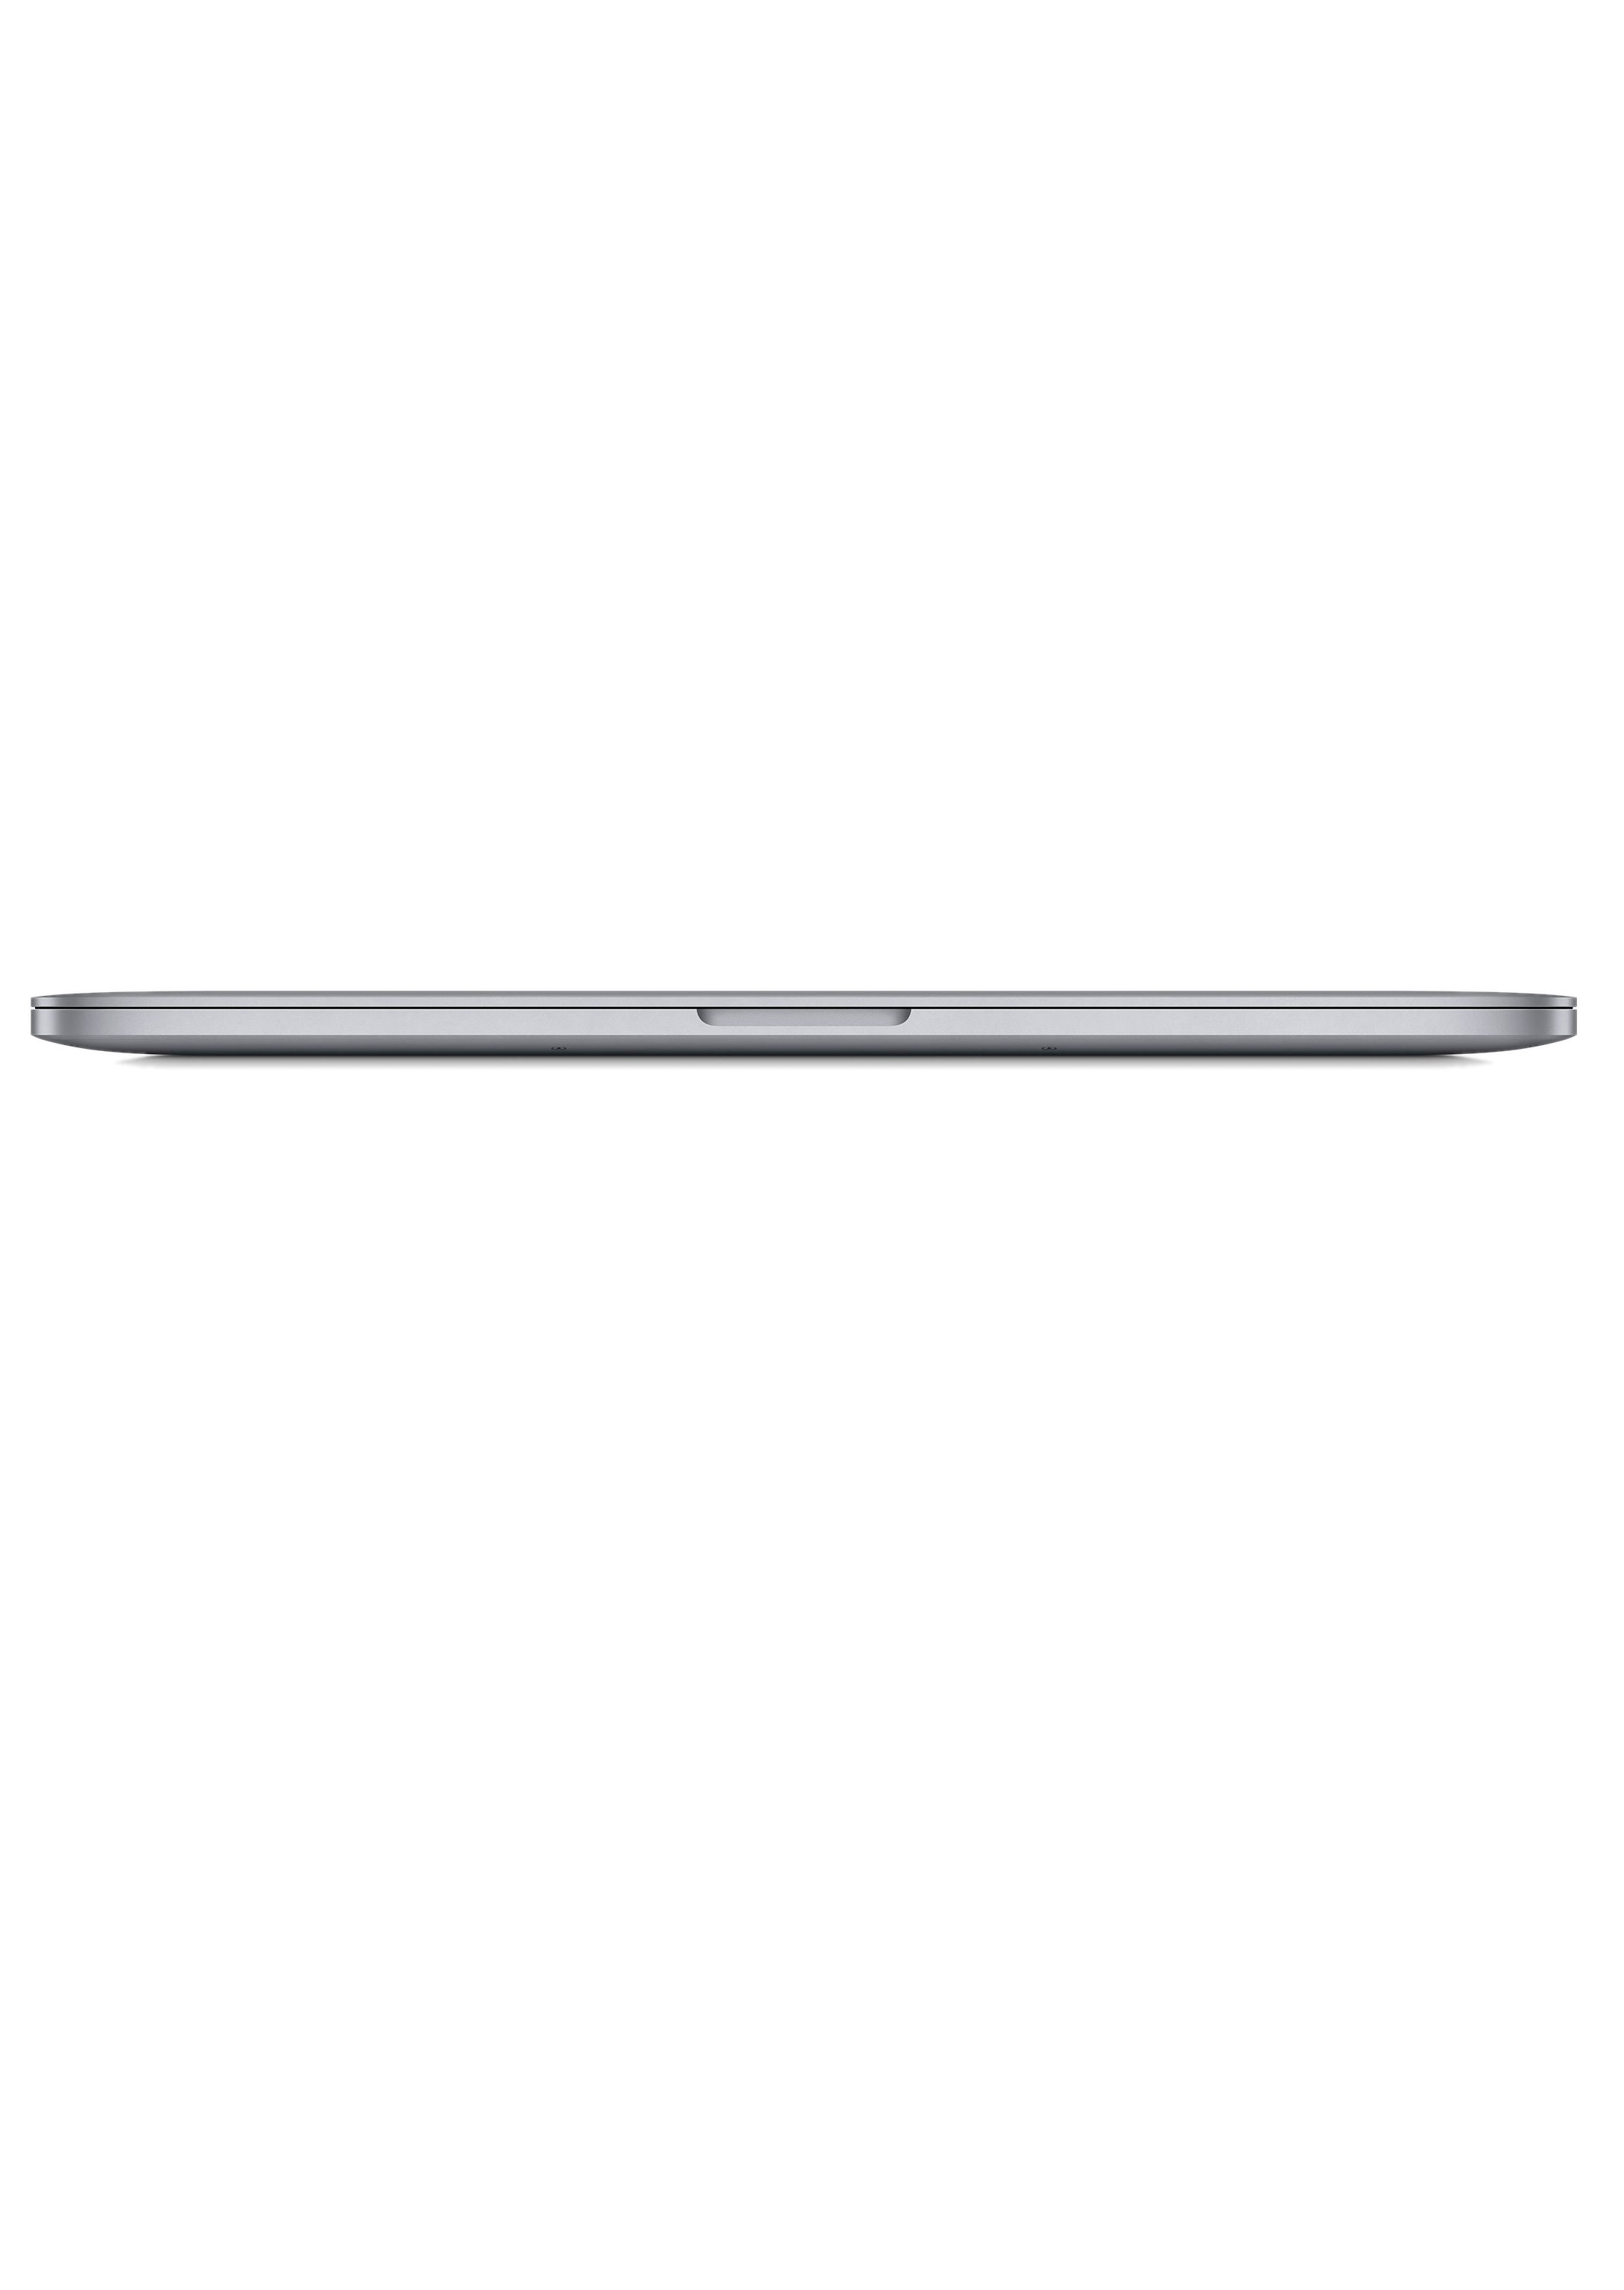 16-inch MacBook Pro: 2,6‑GHz 6‑core i7-processor - 512 GB SSD - 16 GB RAM - AMD Radeon Pro 5300M - Spacegrijs (Nieuw)